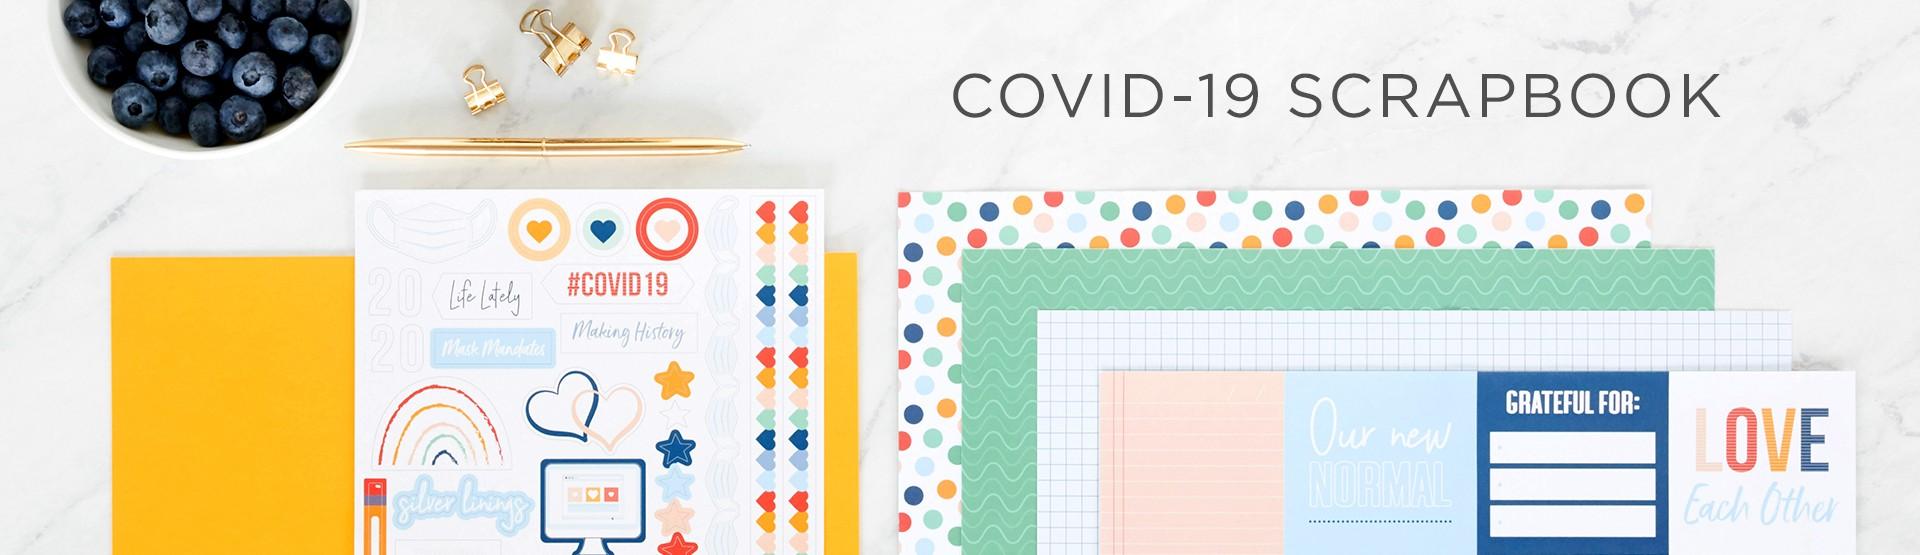 COVID-19 Scrapbook